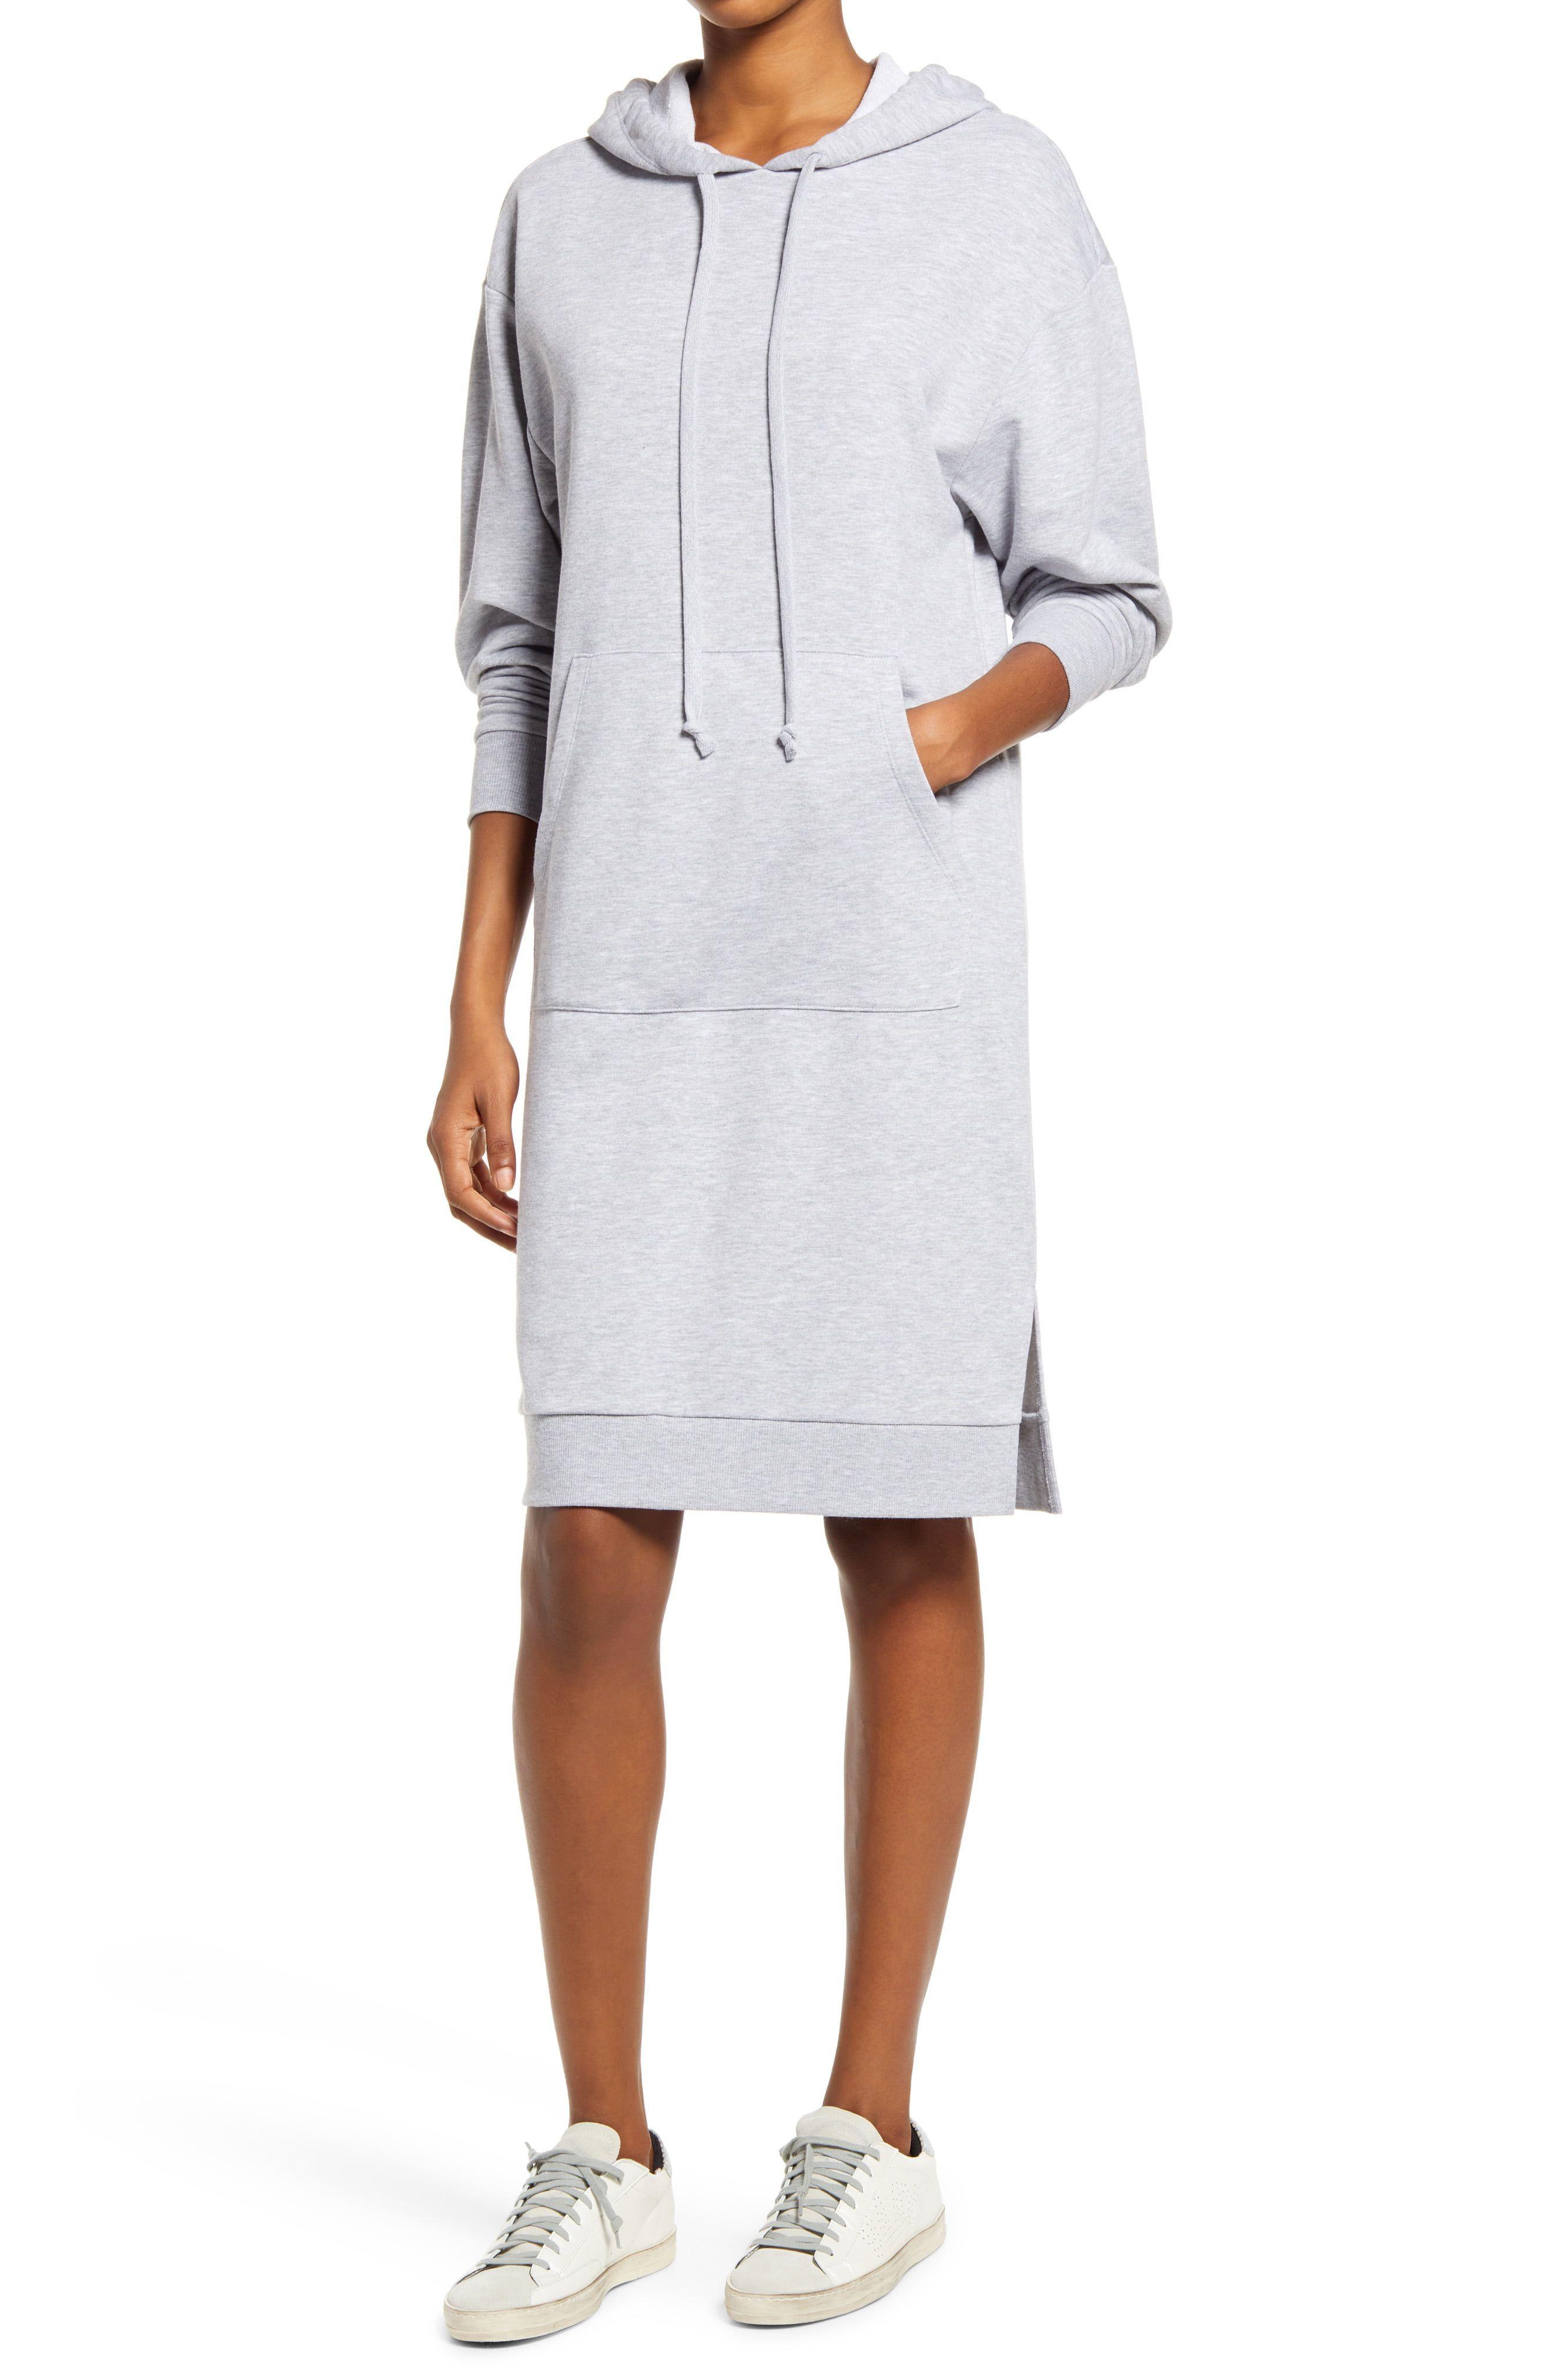 Charles Henry Long Sleeve Knit Hoodie Dress Nordstrom In 2021 Sweatshirt Dress Outfit Long Sweatshirt Dress Hoodie Sweatshirt Dress [ 4048 x 2640 Pixel ]